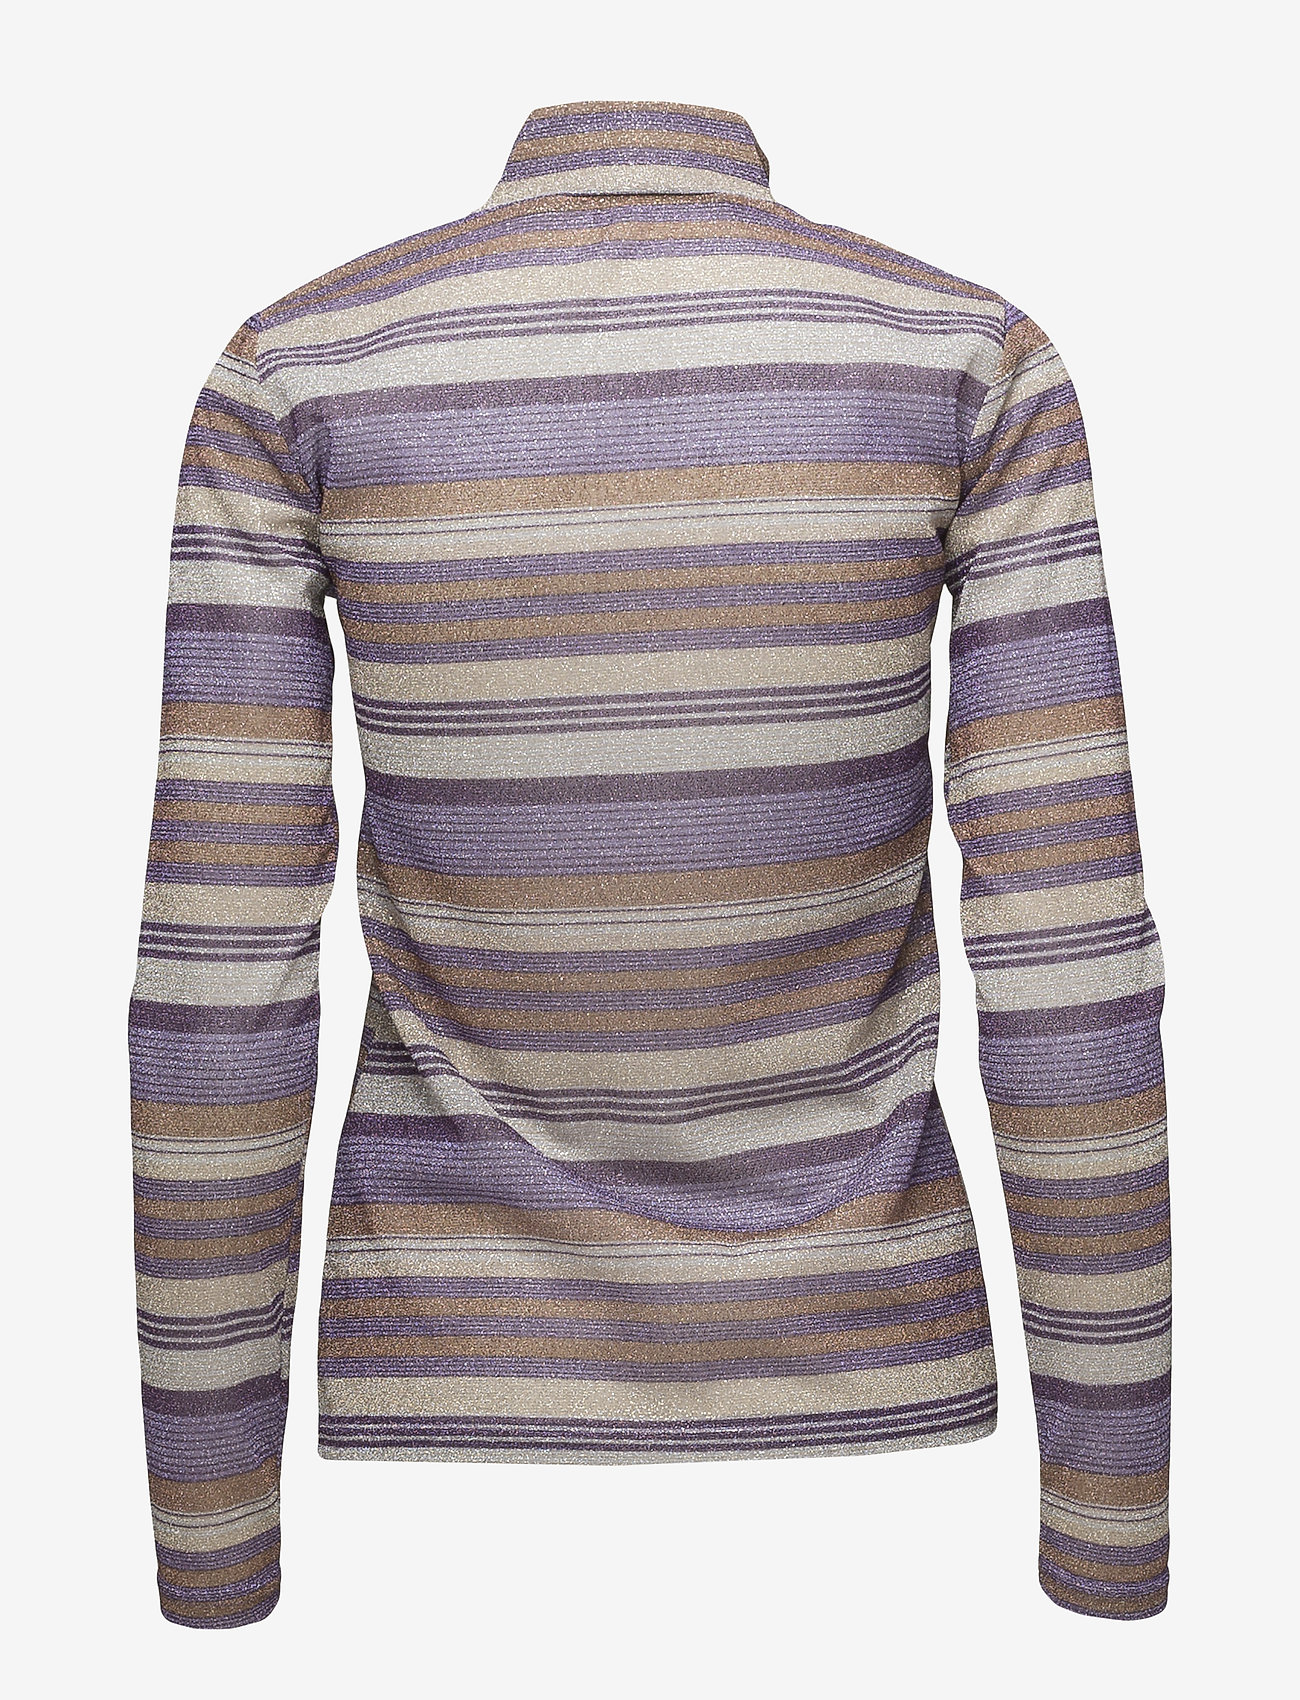 Gestuz - Shine turtleneck MA18 - langärmlige tops - purple/gold - 1